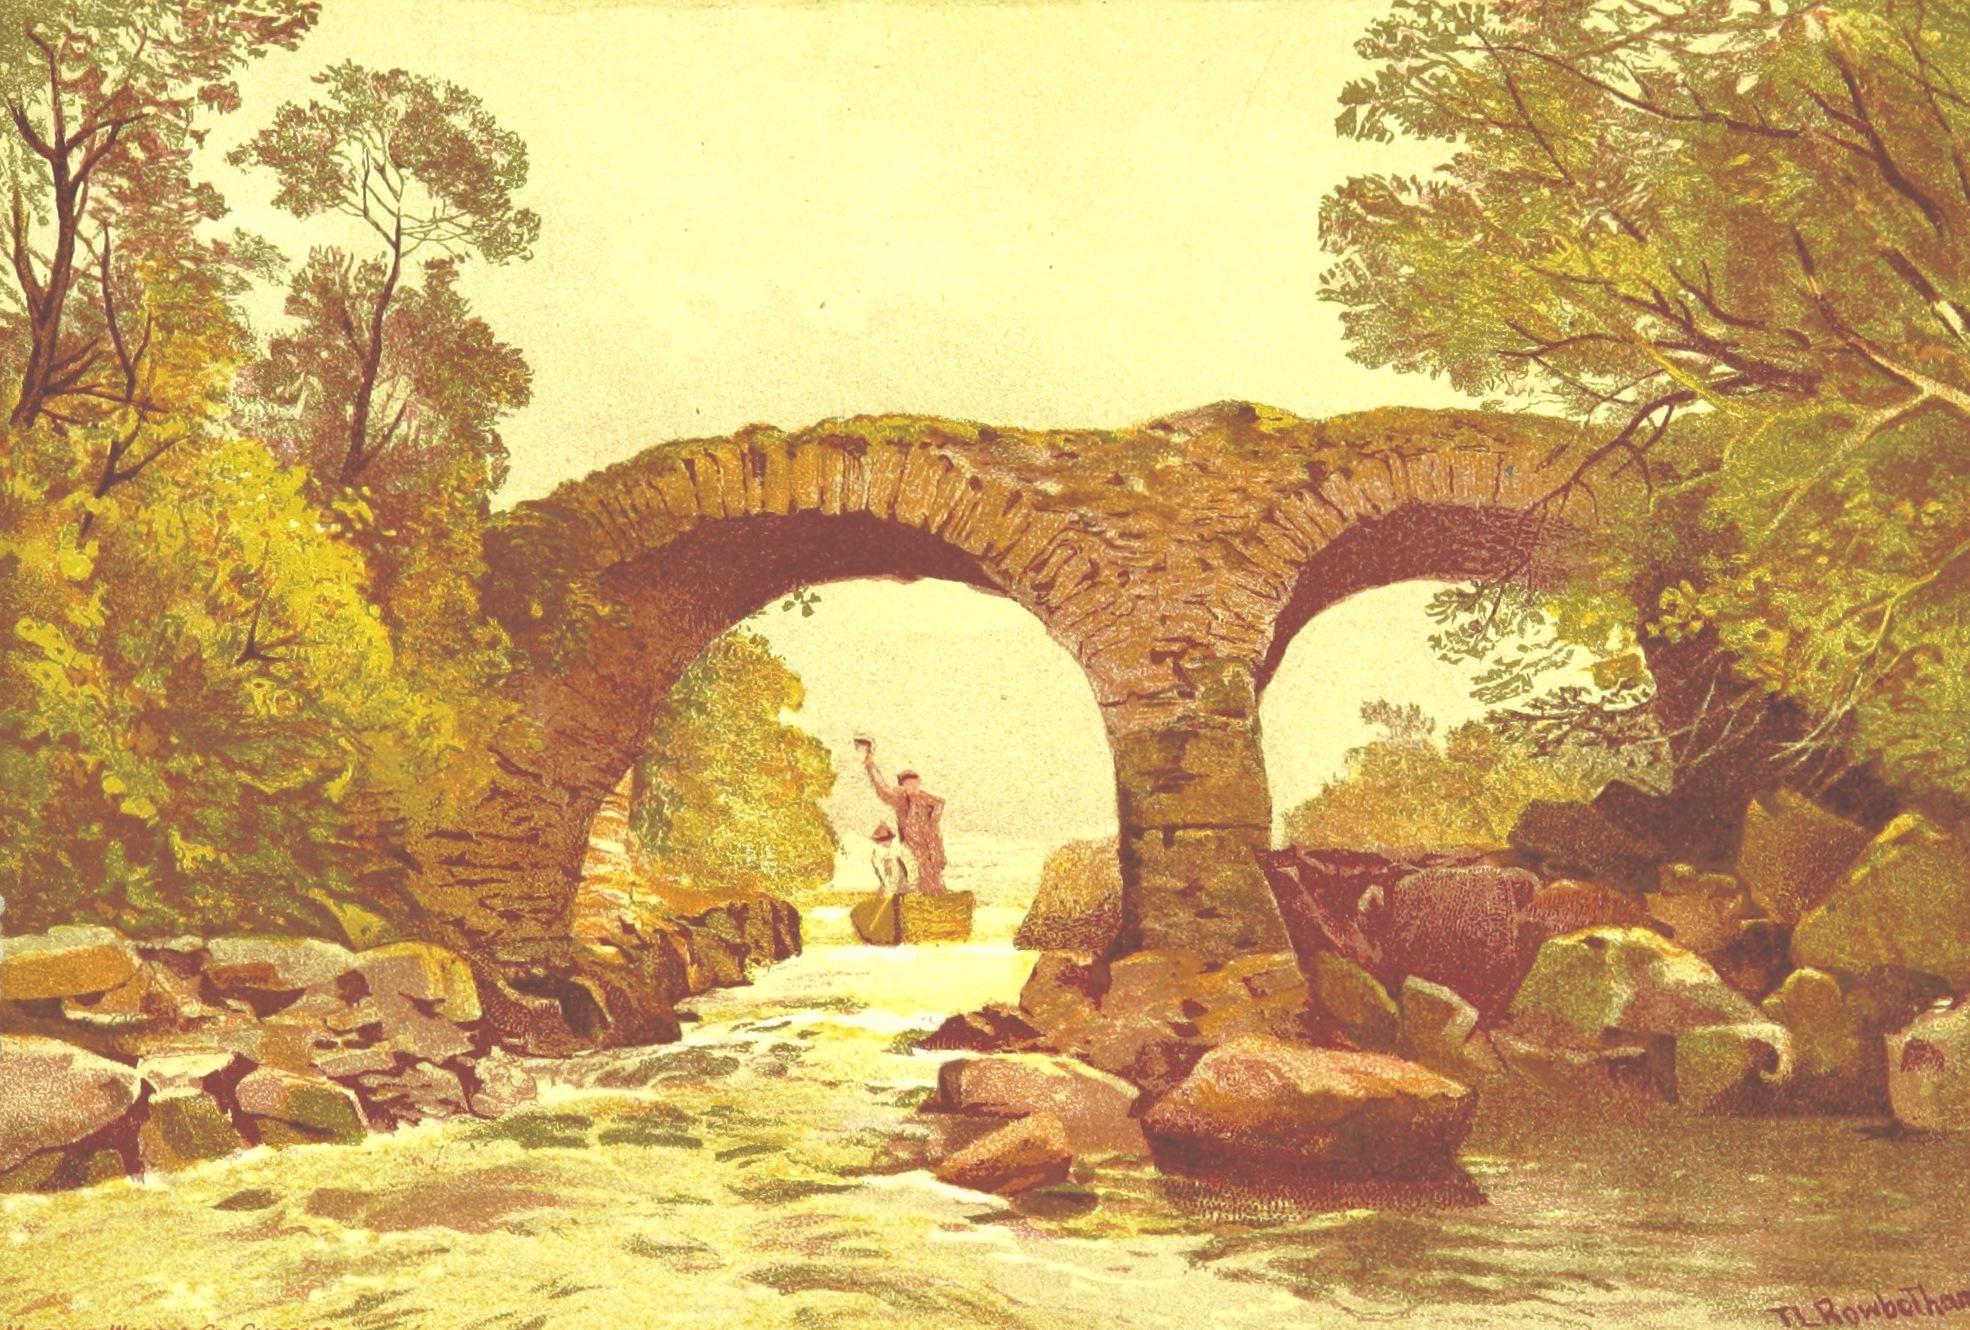 Views of Wicklow and Killarney - Old Weir Bridge (1875)